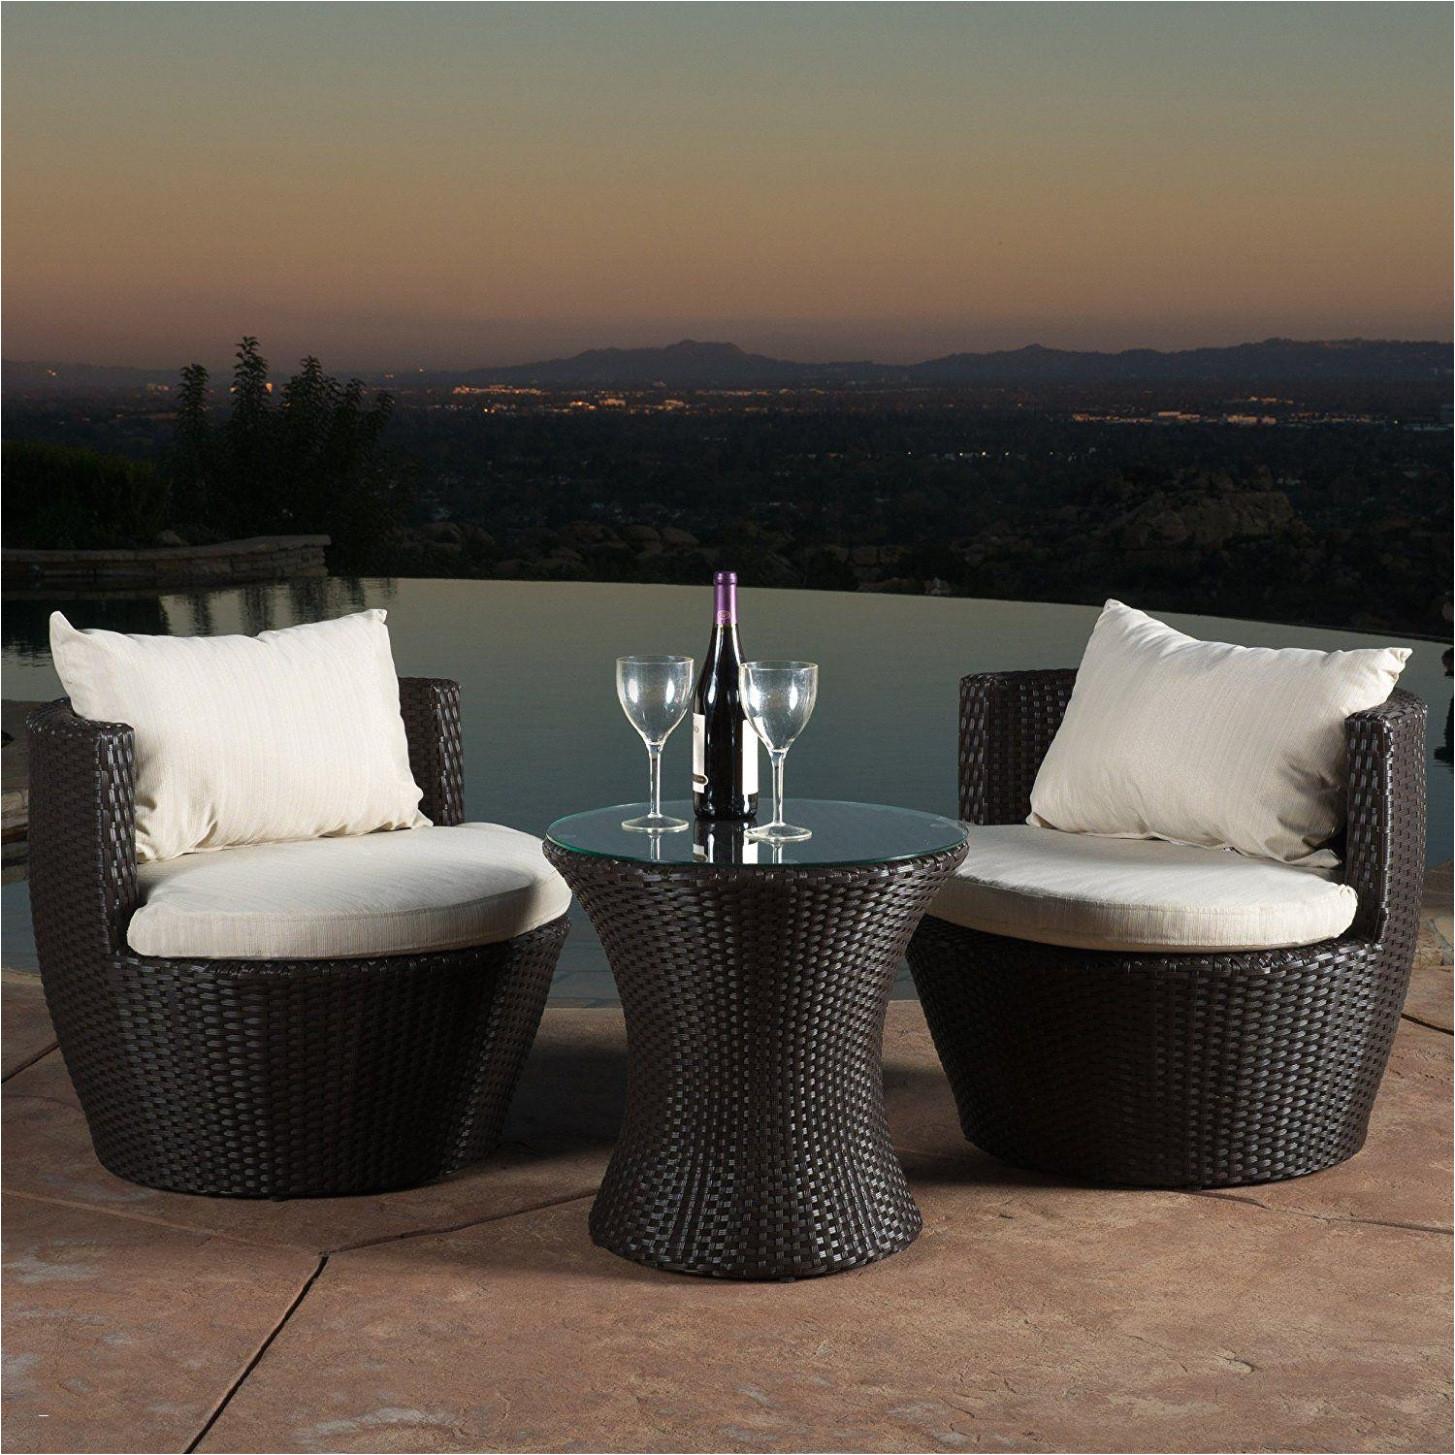 Kid Friendly Coffee Table Ideas Luxury Cool Small Outdoor Water Feature Ideas Coffee Tables Rowan Od